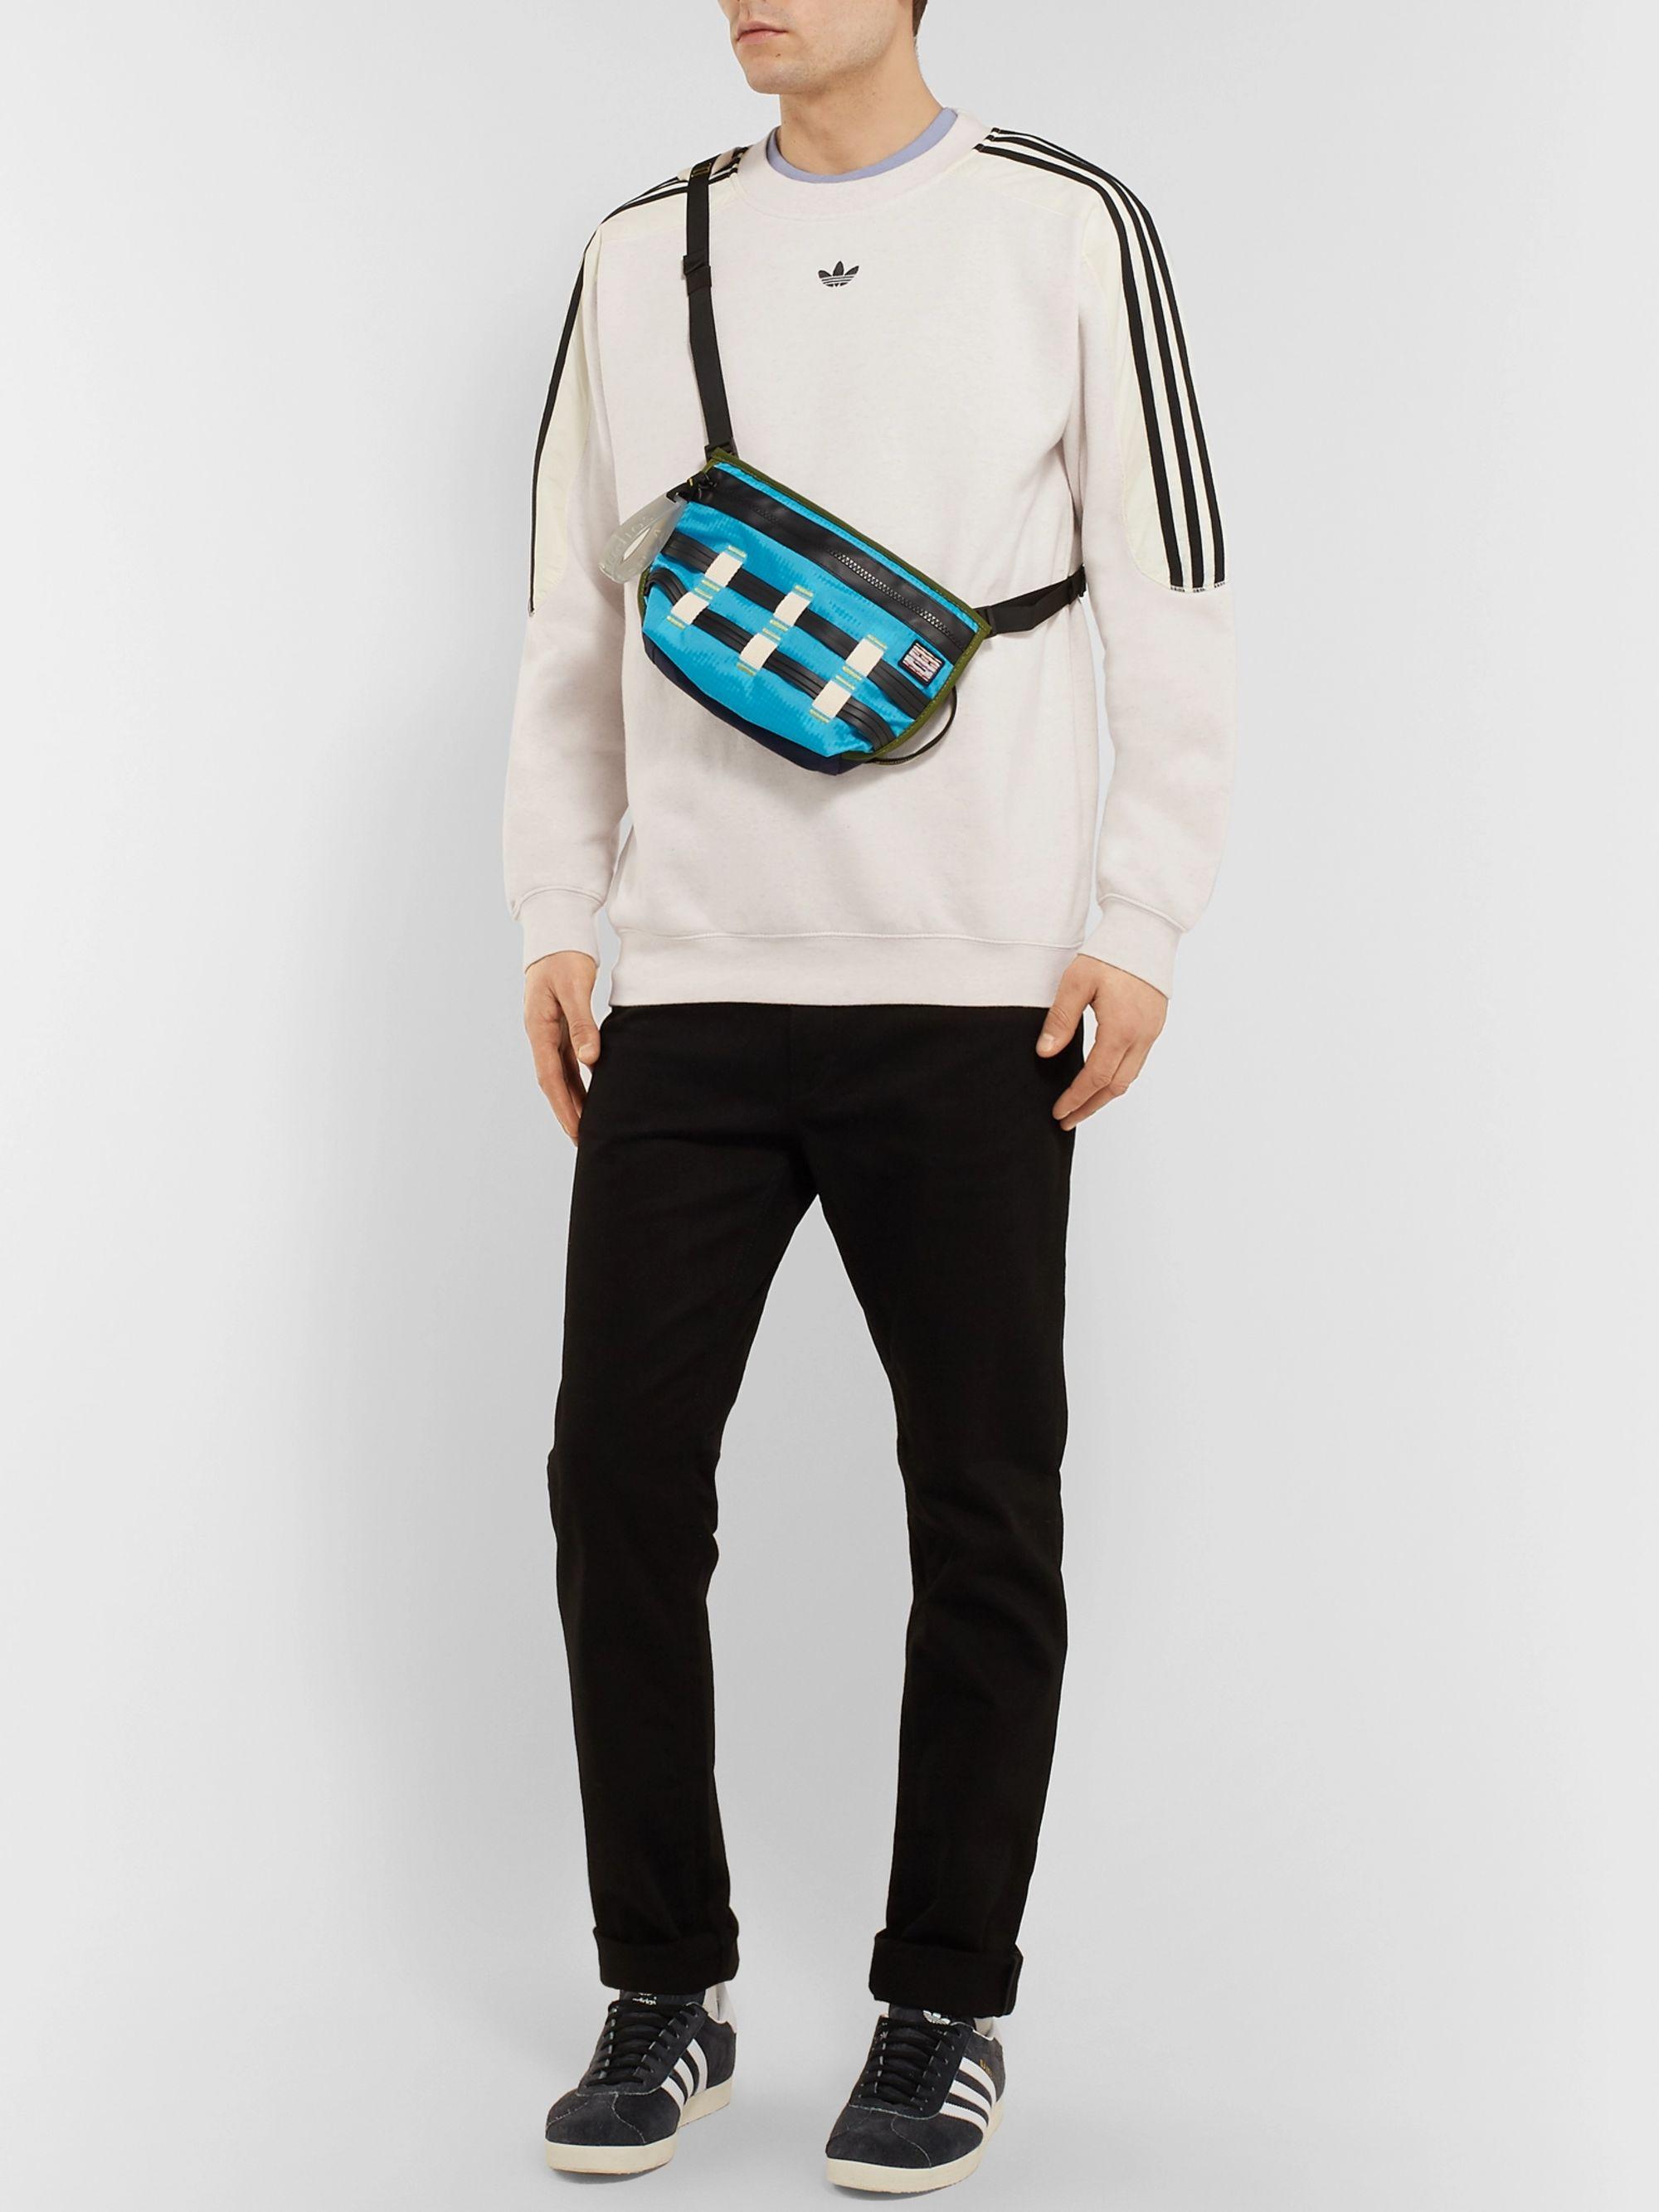 Men adidas Originals Radkin Sweatpants Cheap Off White